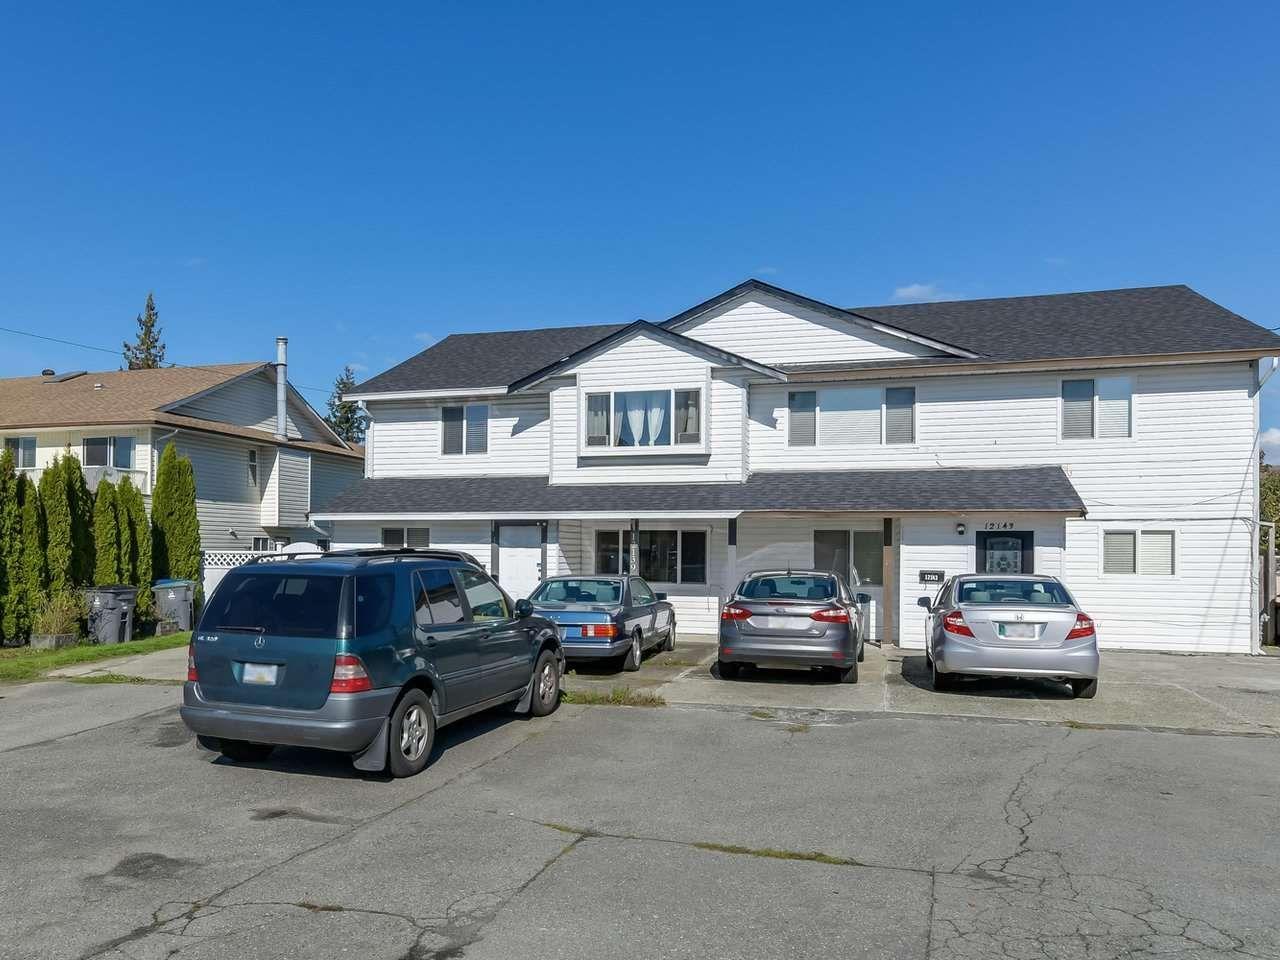 Main Photo: 12139 98 Avenue in Surrey: Cedar Hills 1/2 Duplex for sale (North Surrey)  : MLS®# R2313874